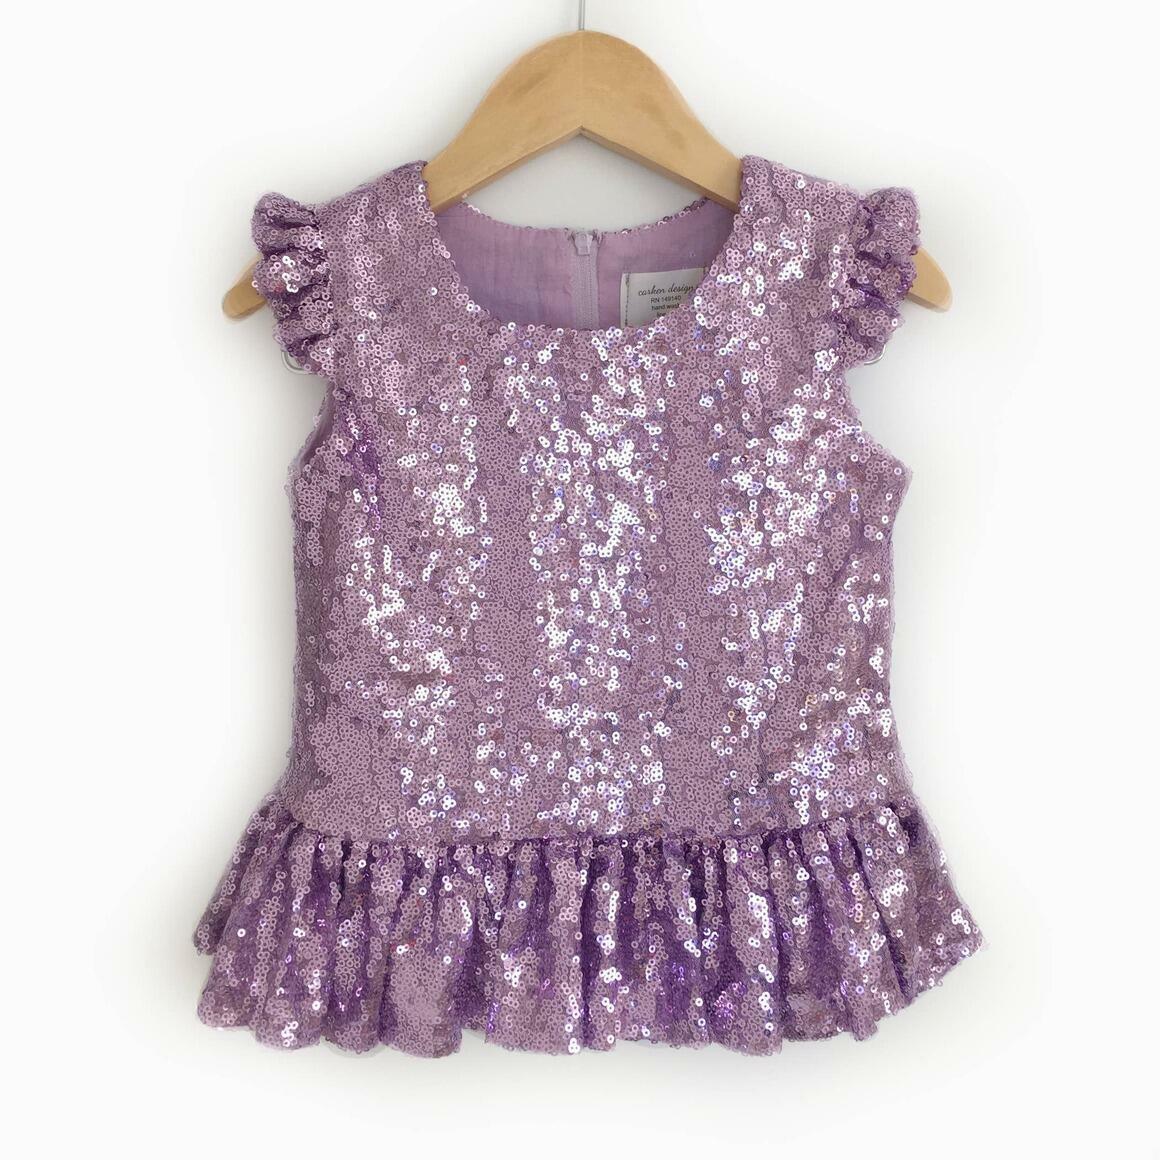 Lavender Sequin Peplum Top | Trada Marketplace